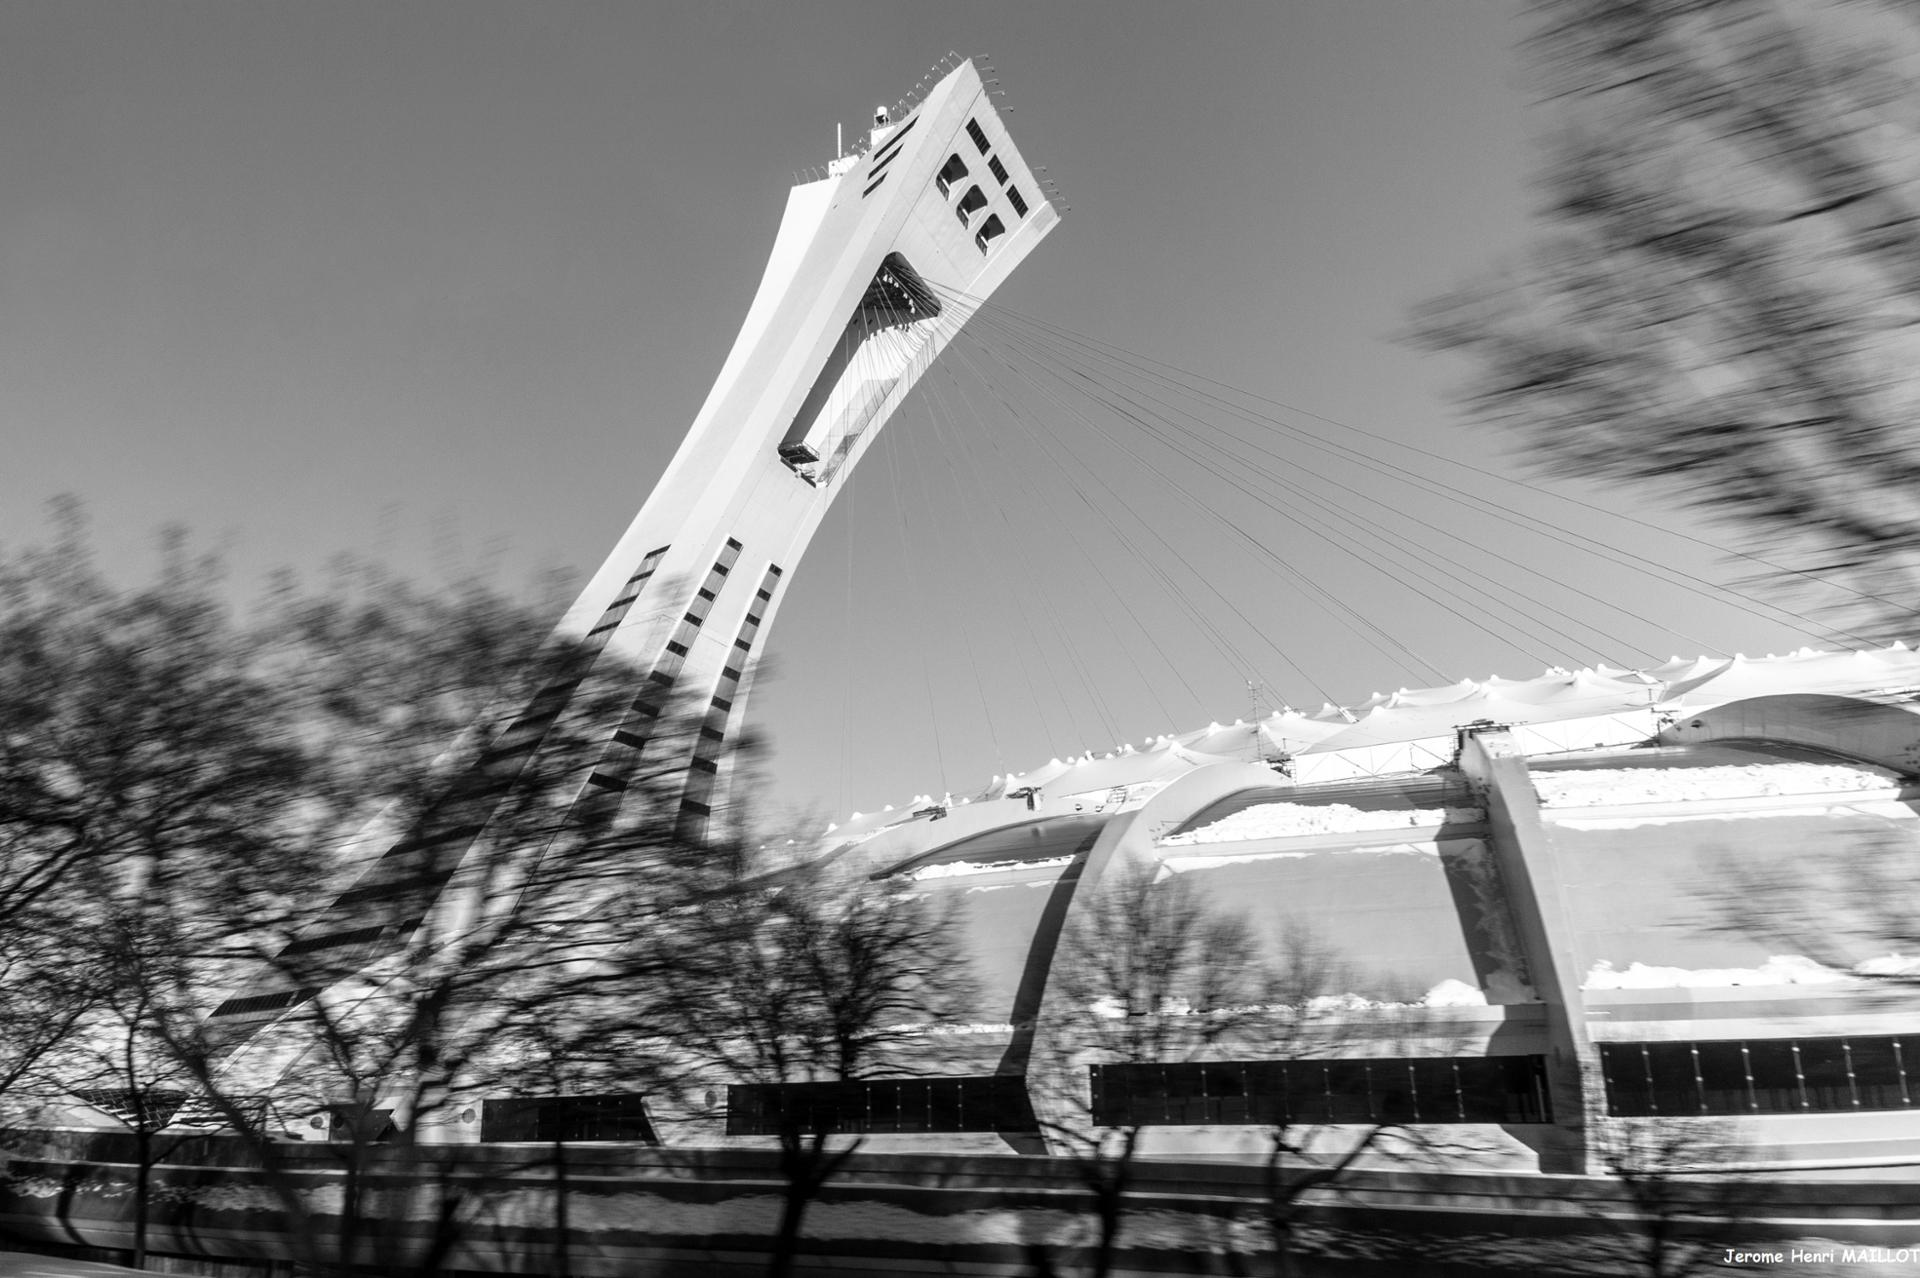 Olympic Speed